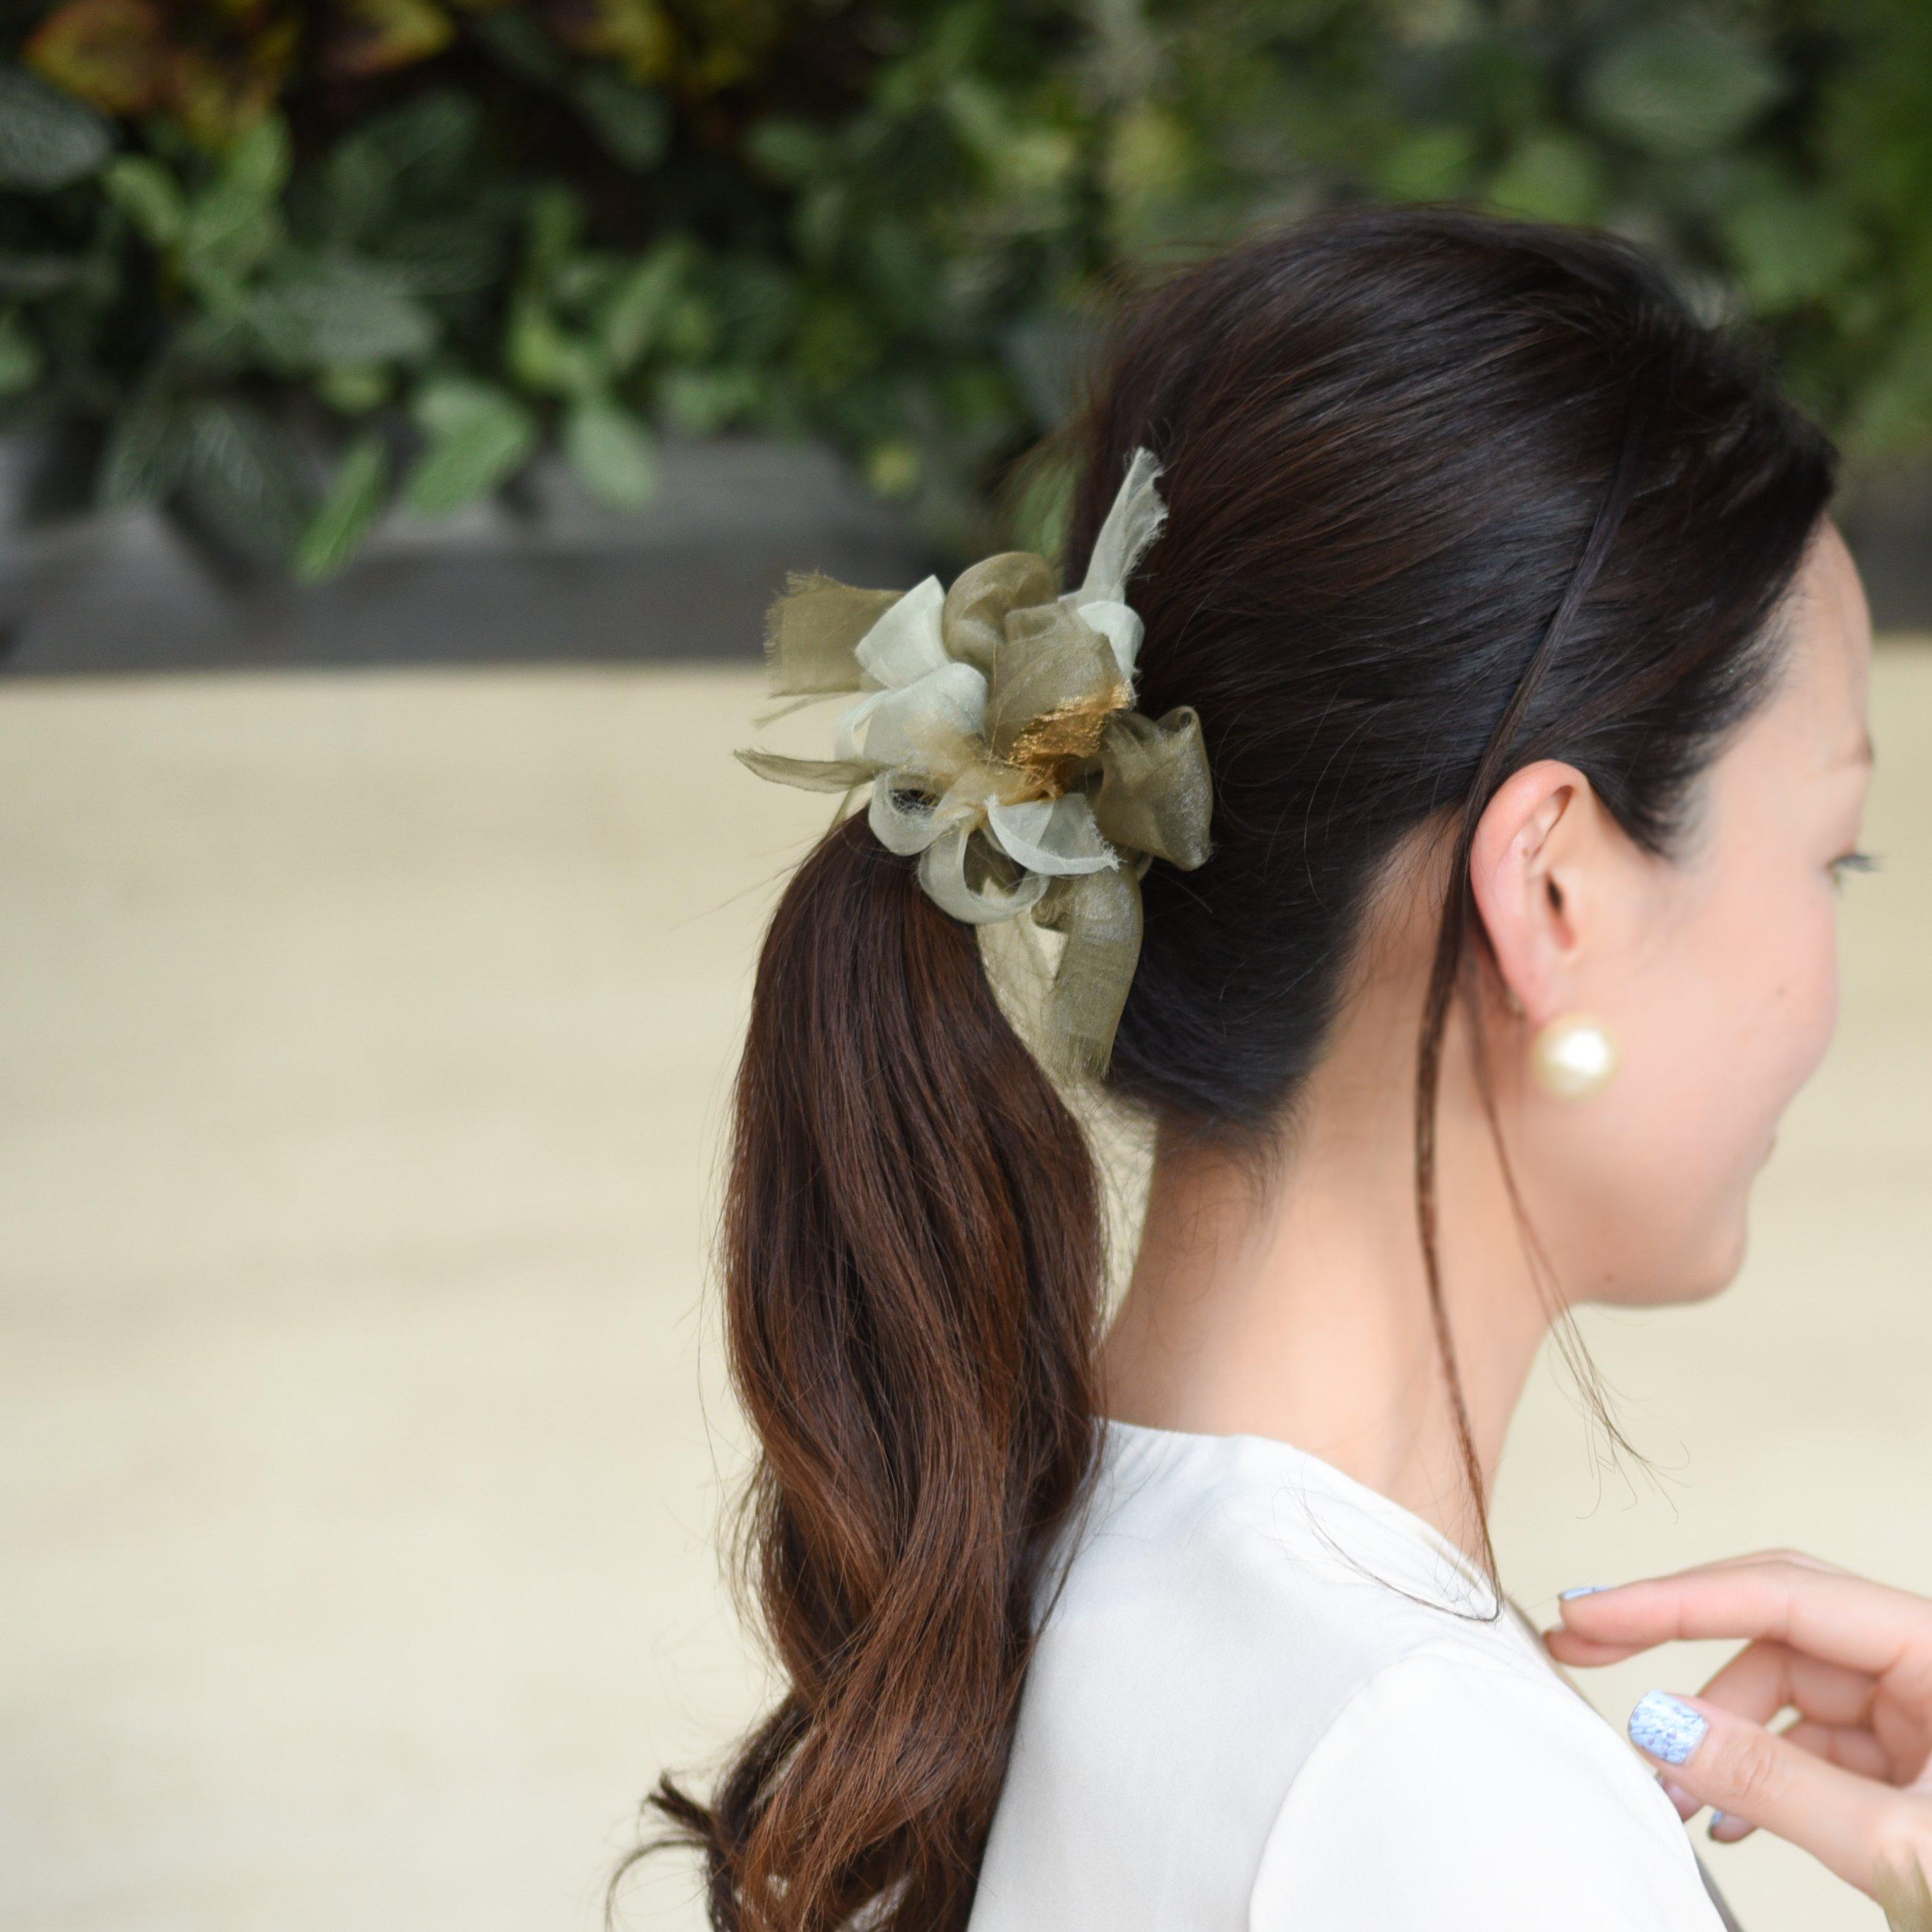 <mini>抹茶~彩る咲き編みシュシュ